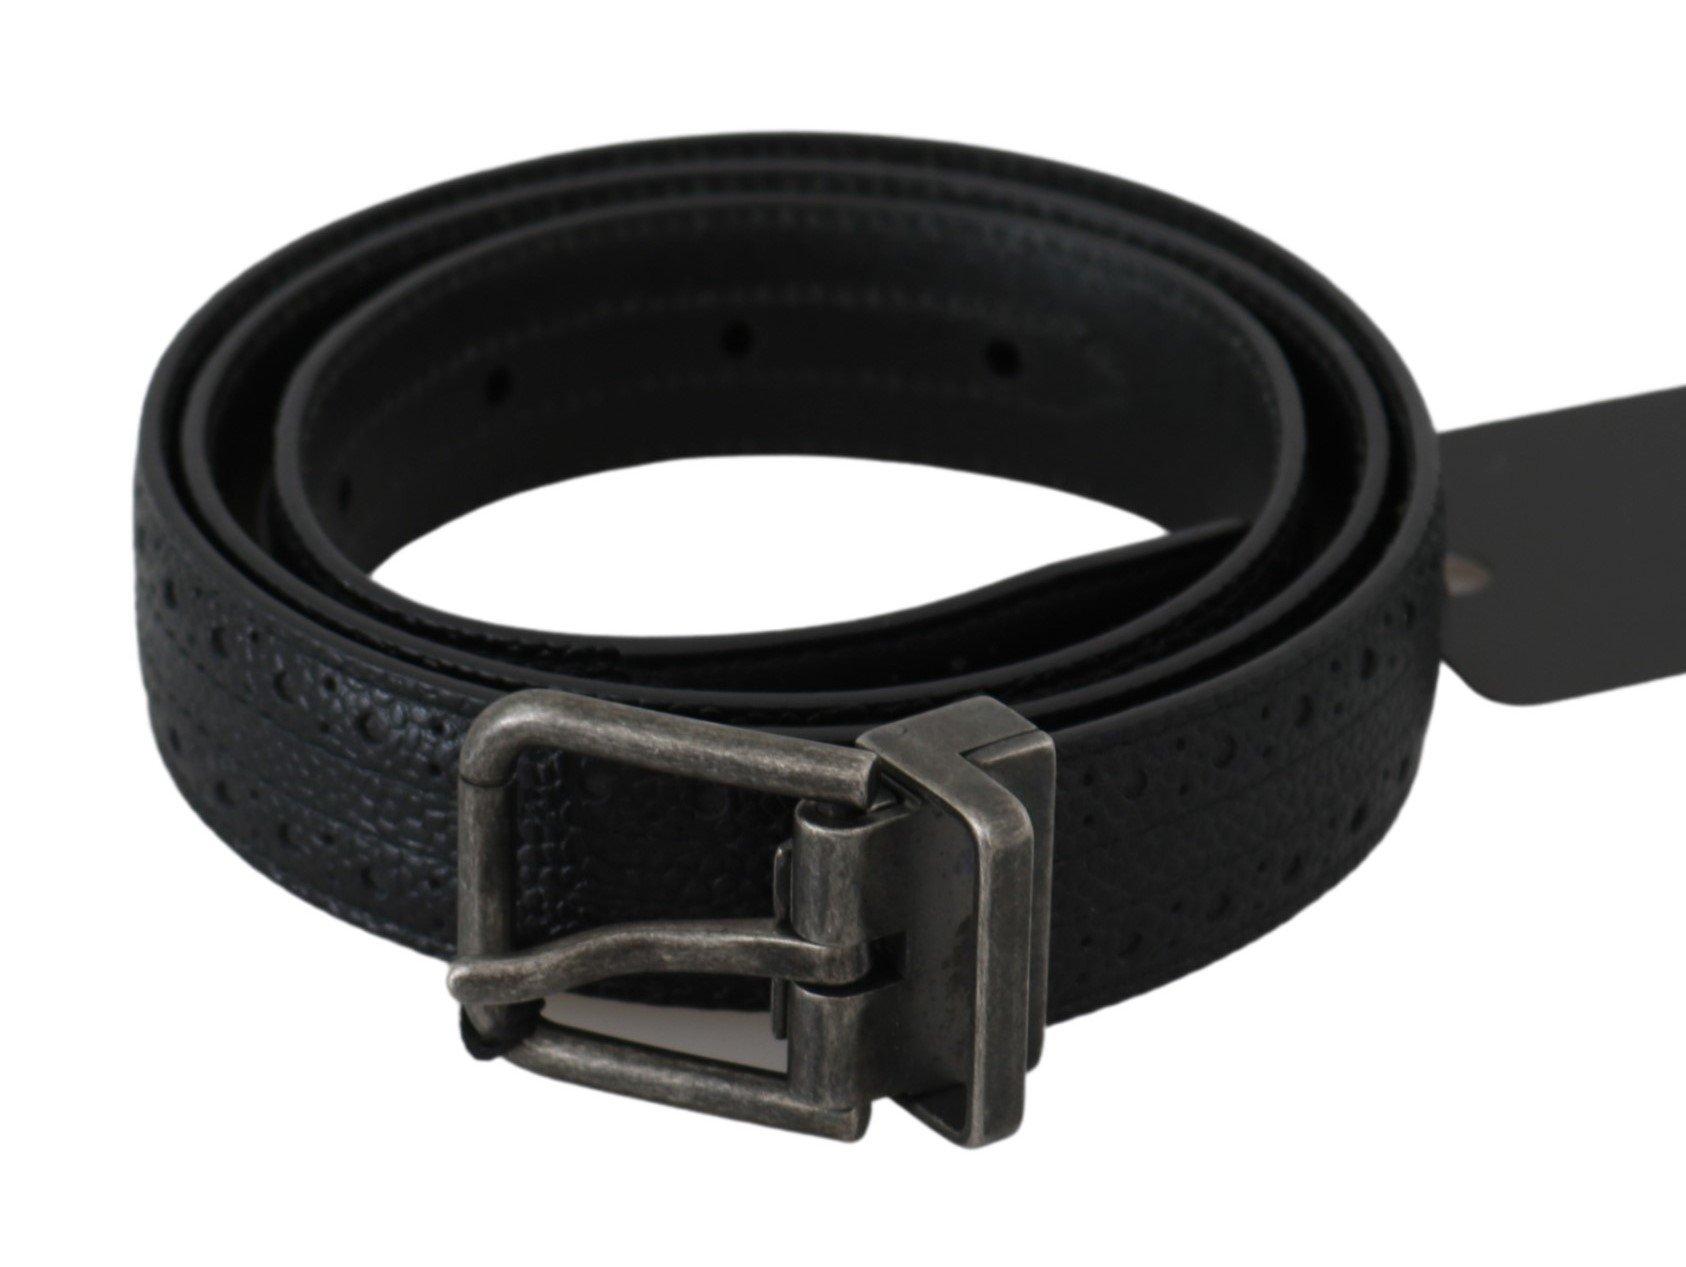 Dolce & Gabbana Men's Buckle Waist Leather Belt Gray BEL60476 - 85 cm / 34 Inches